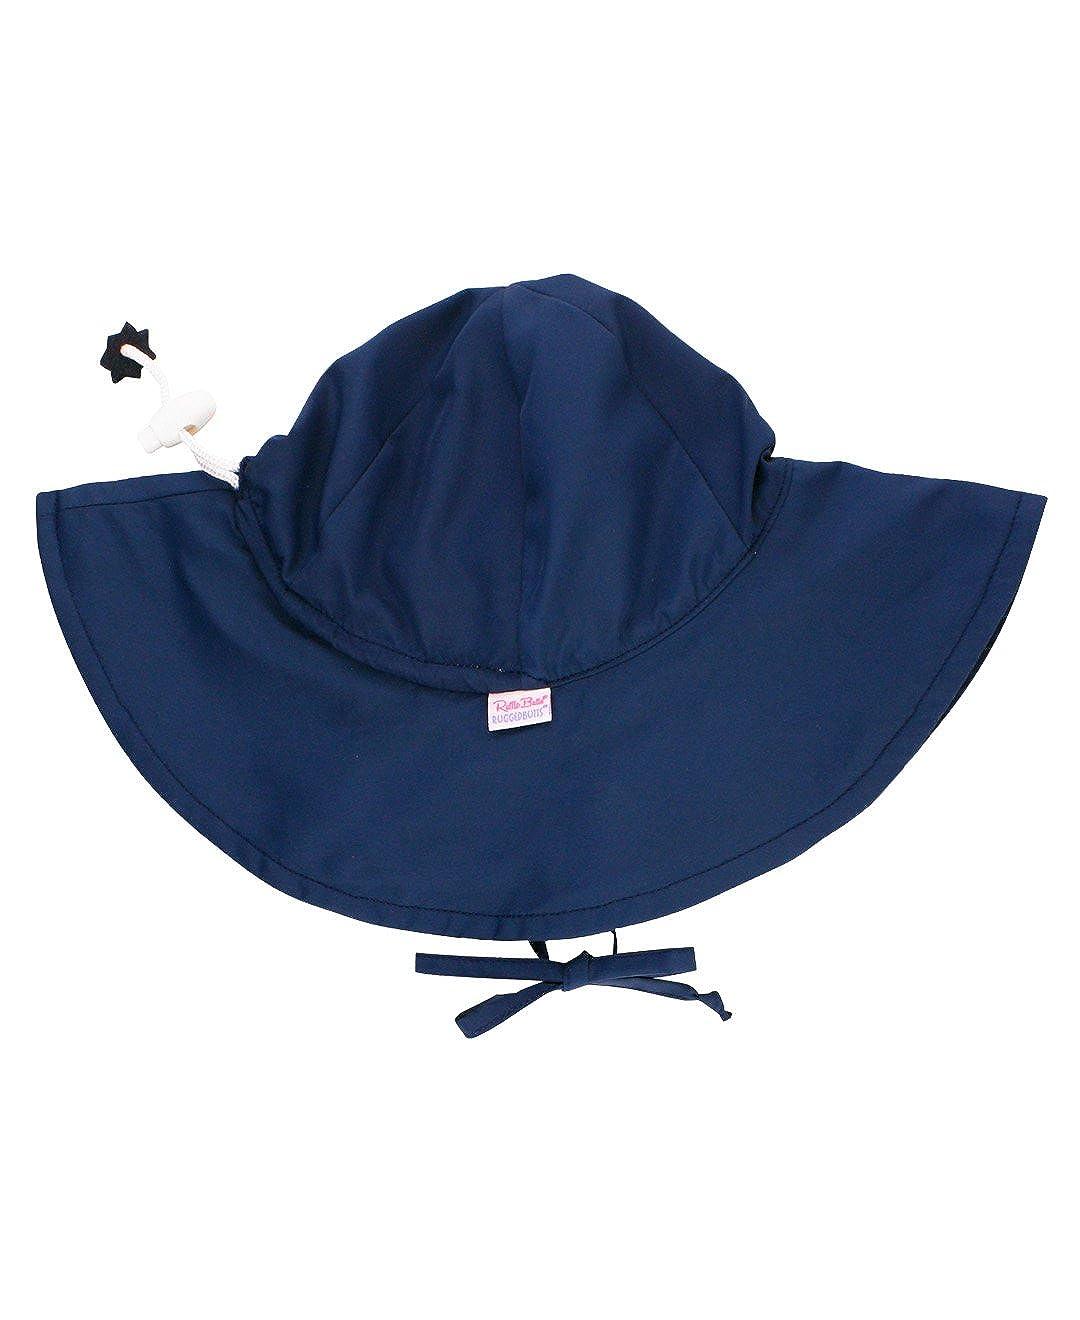 Amazon.com  RuffleButts Baby Toddler Girls Baby Sun Hat UPF 50+ Sun  Protection Floppy Wide Brim  Clothing fa5c14fc5fc